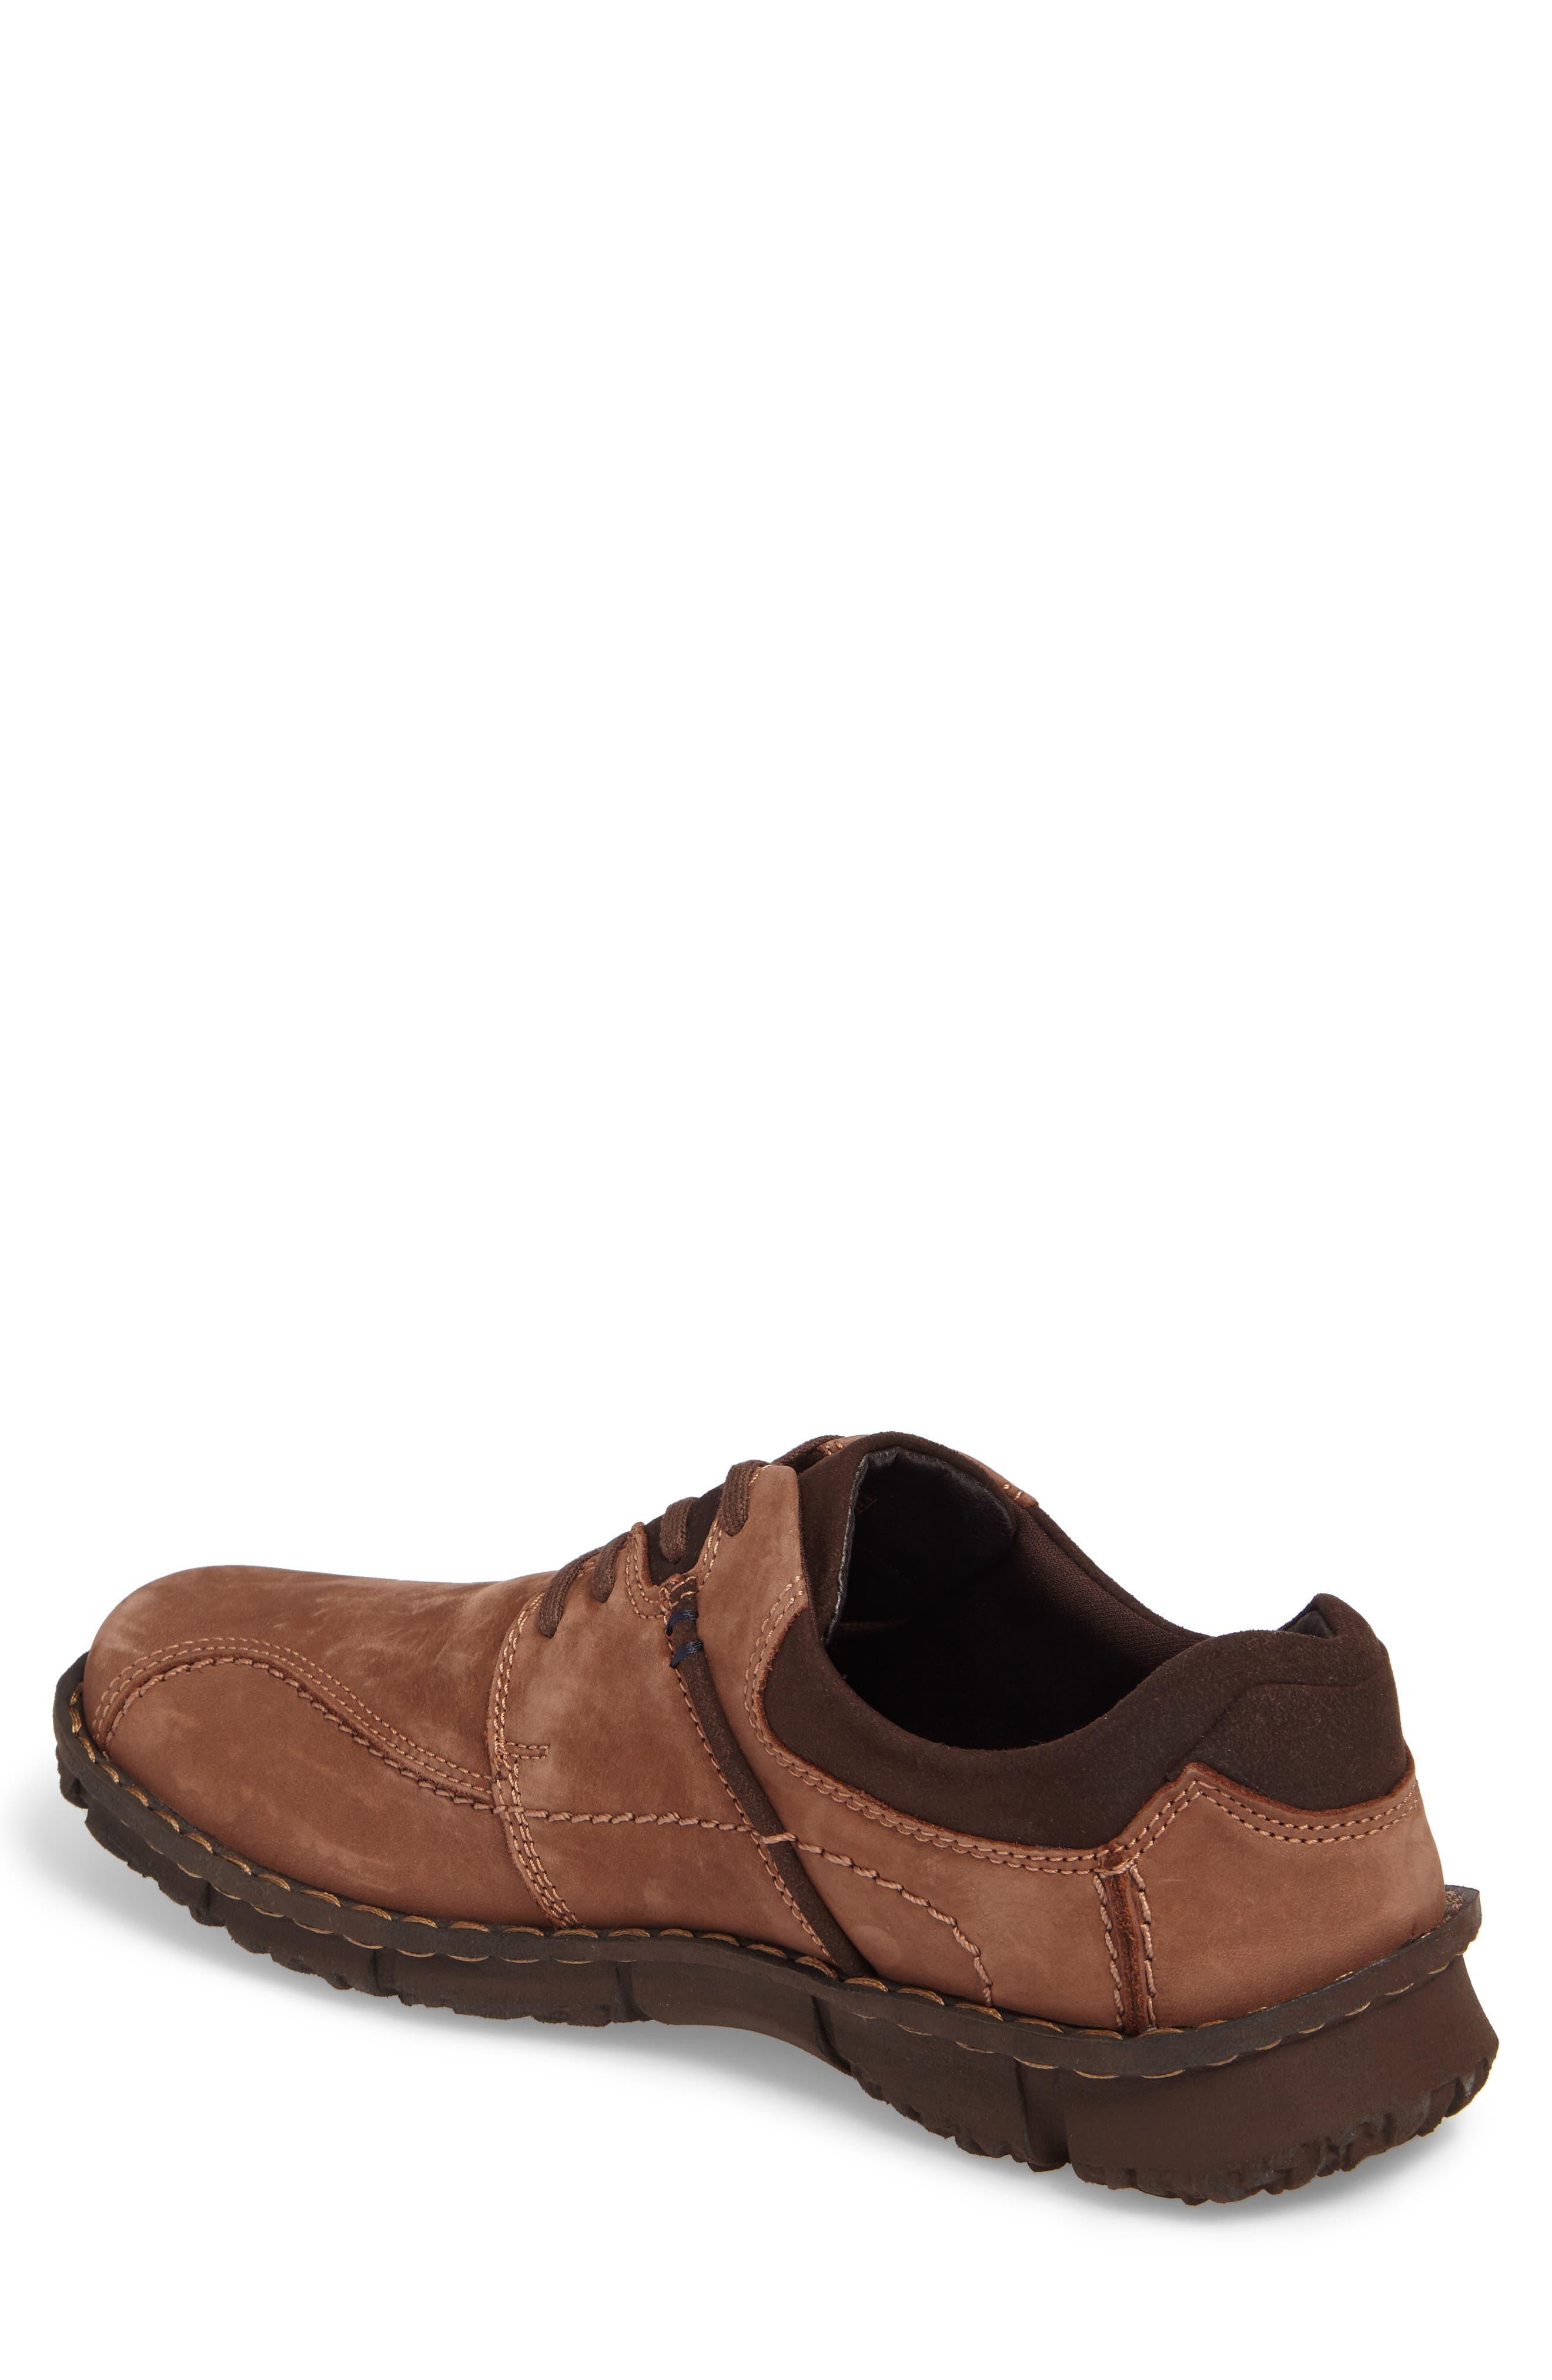 Alternate Image 2  - Josef Seibel Willow Waterproof Sneaker (Men)